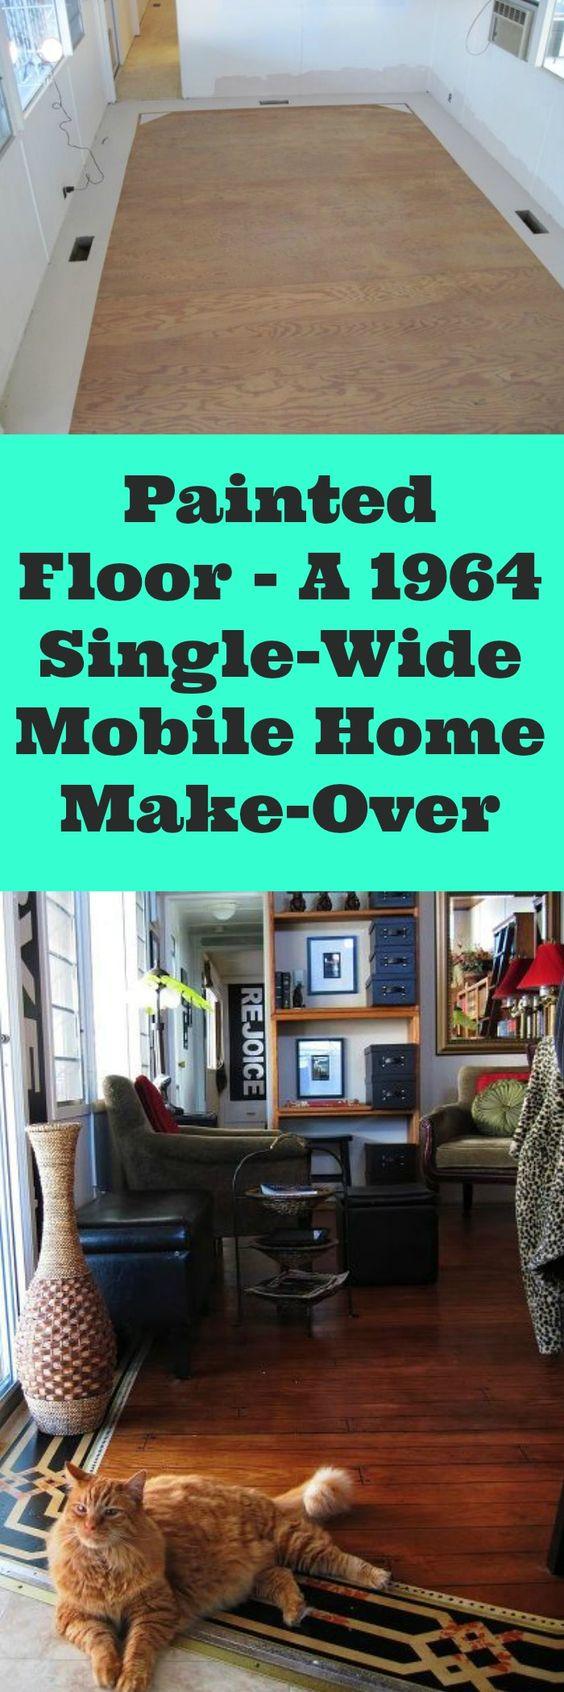 A 1964 Single-Wide Mobile Home Make-Over